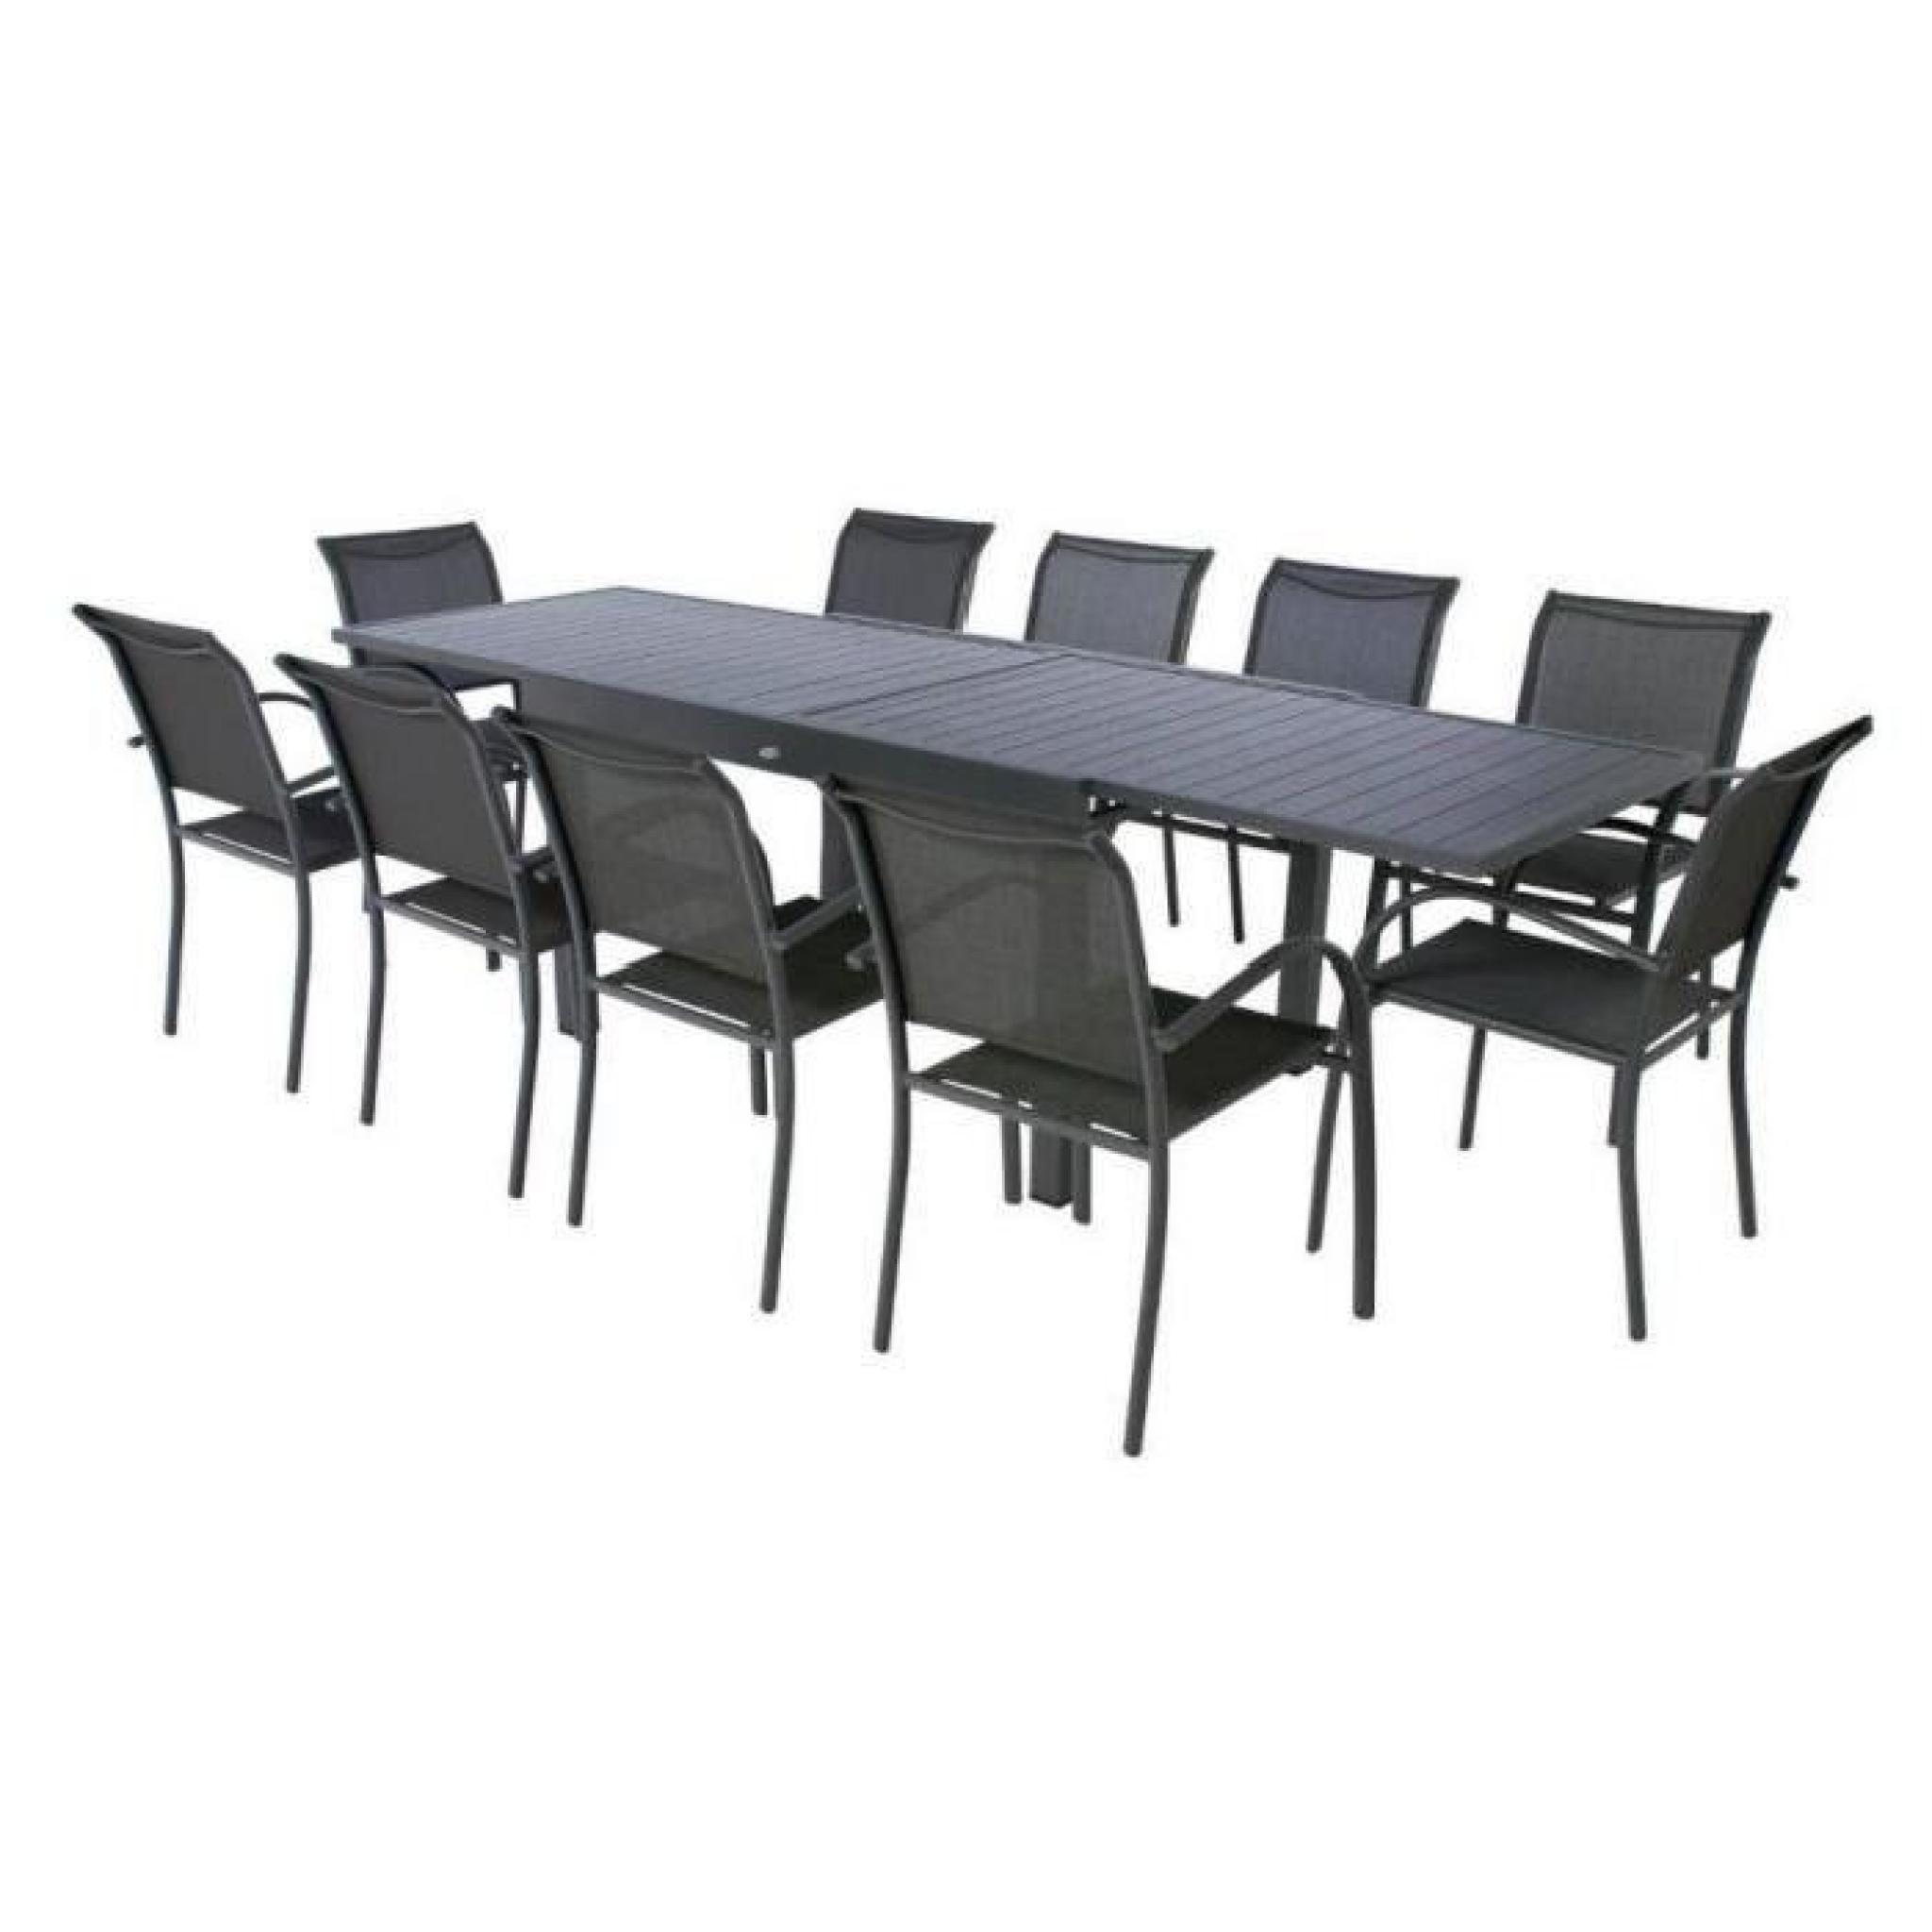 table piazza alu hesperide extensible 10 p graphite achat vente table de jardin extensible. Black Bedroom Furniture Sets. Home Design Ideas